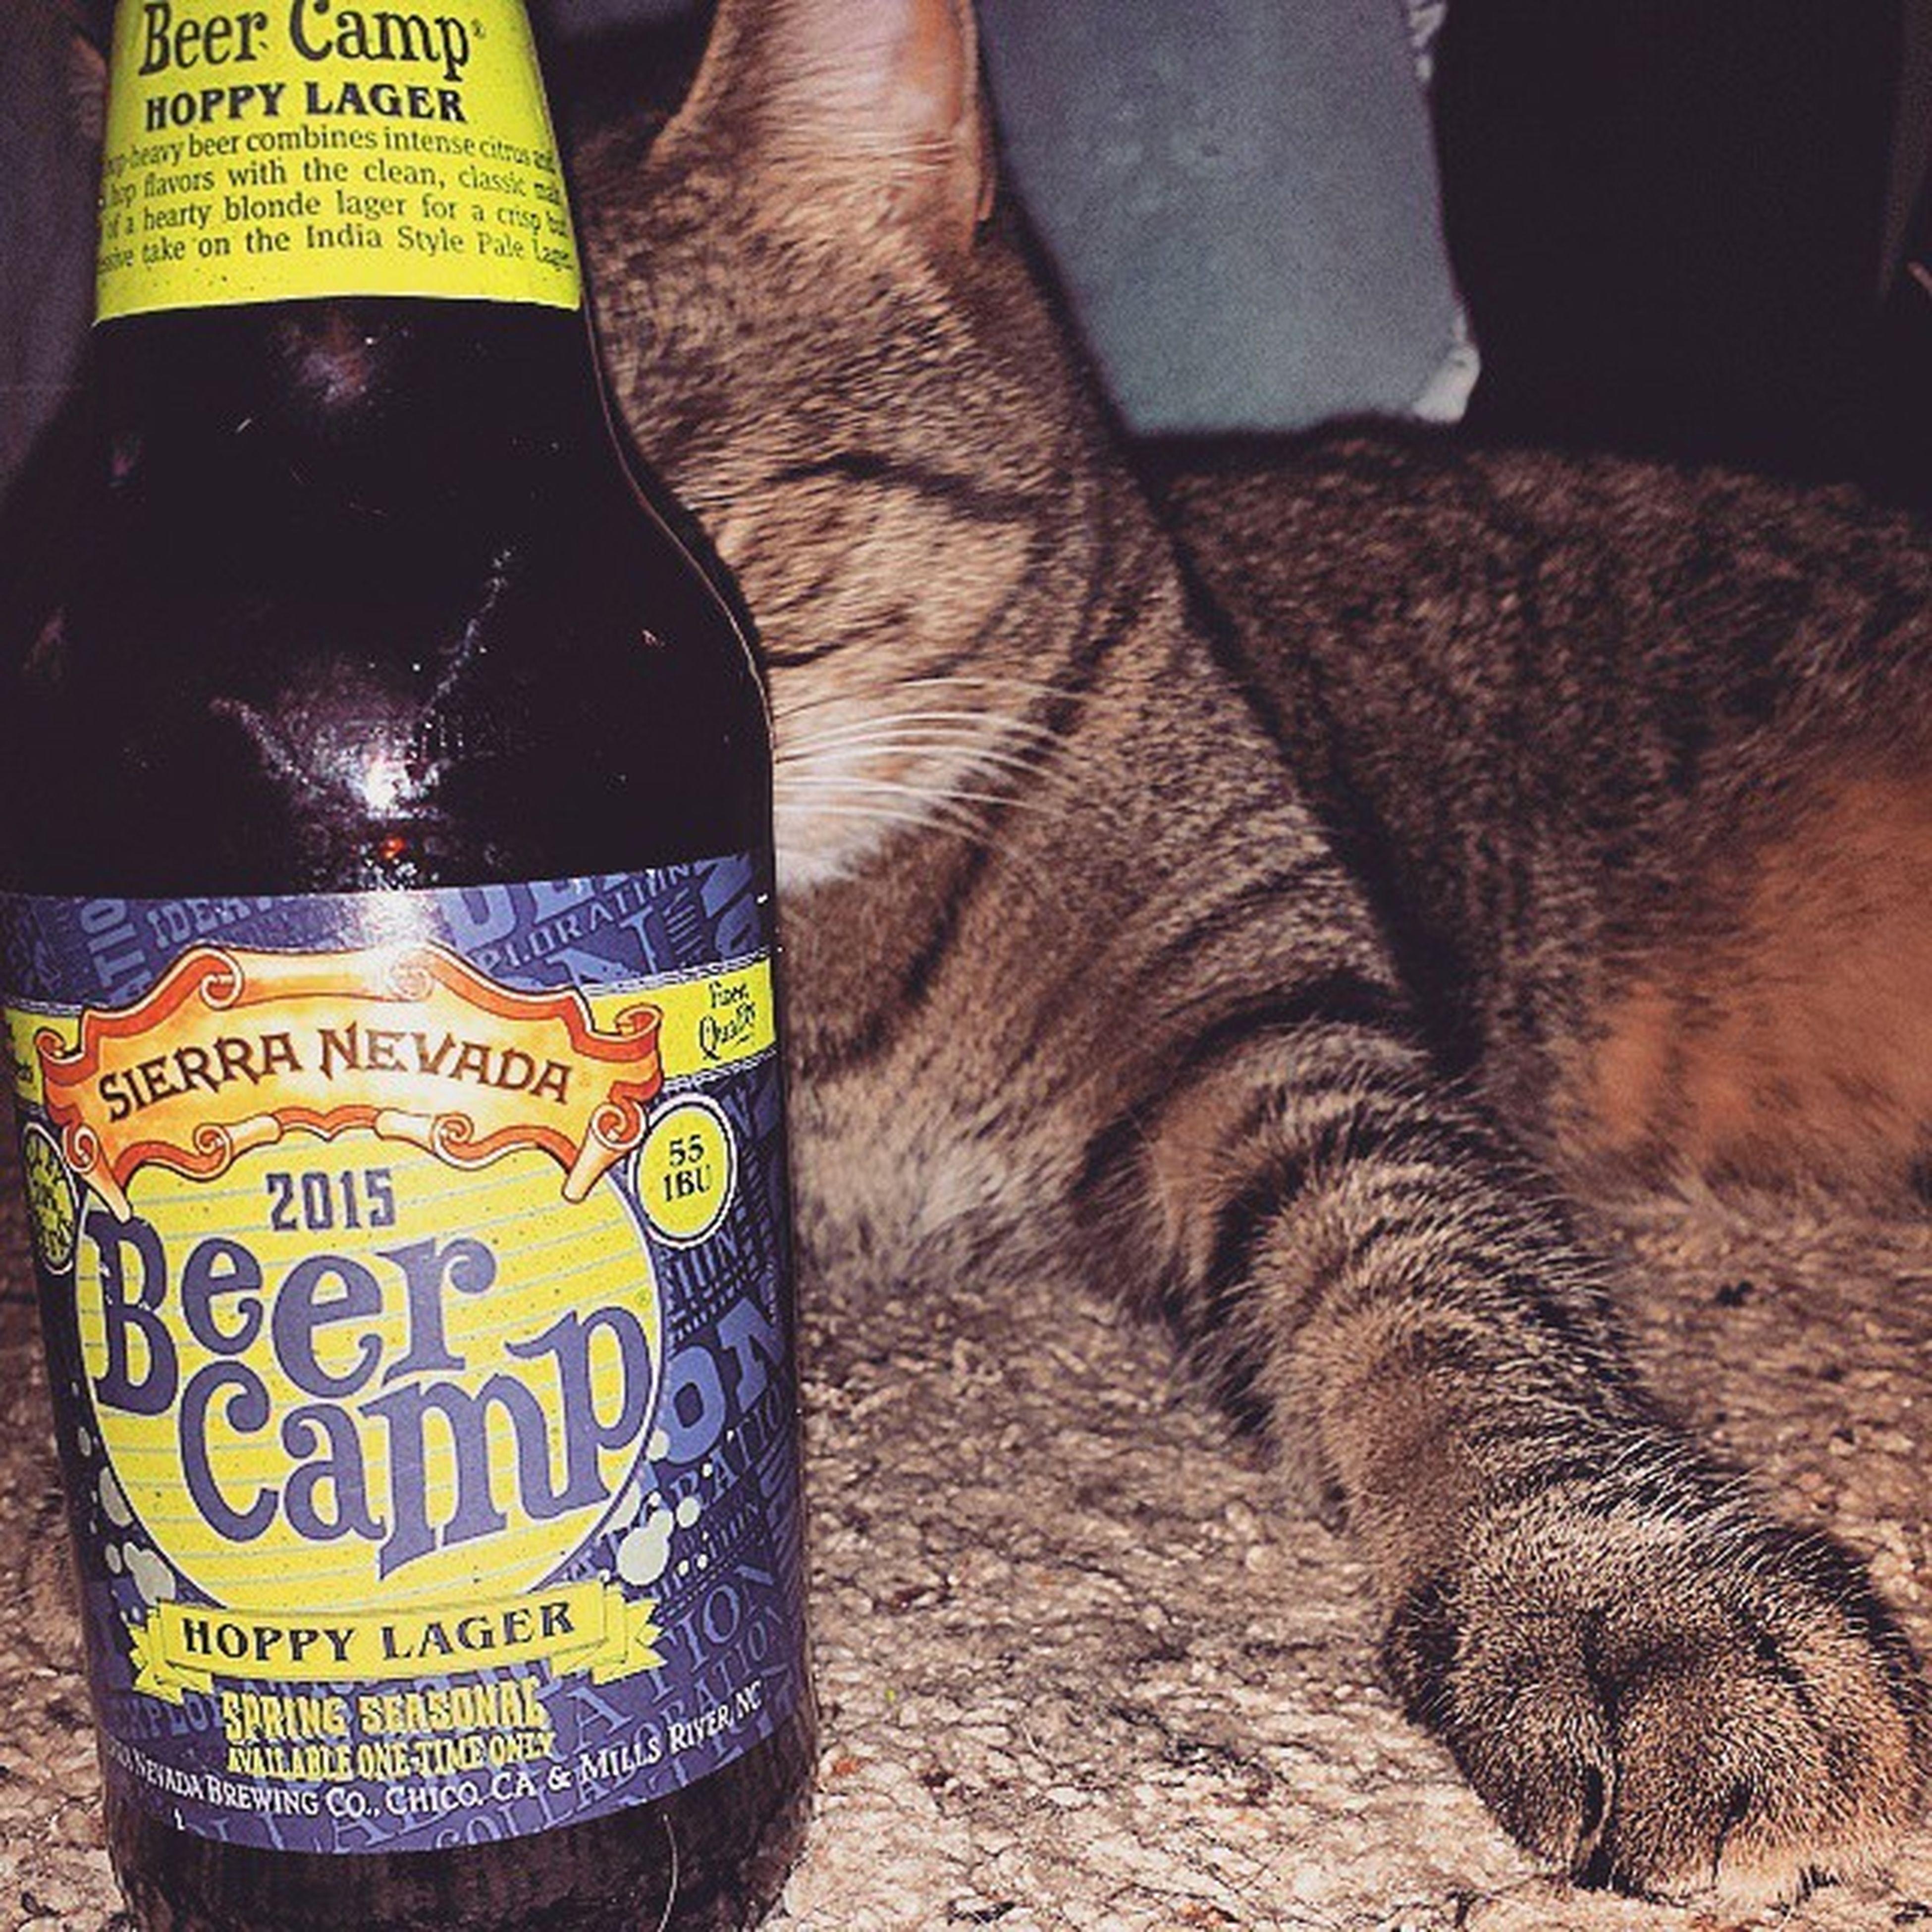 The exclusive Beercamp Sierranevada Seirranevadabrewing Onetimeonly Seasonal Spring 2015  Indiapalelager Thinkwarmthoughts California Hoppylager Springseasonal BabyMax Finestquality Craftbeer Craft Craftbrew Brew Teddybrewski Brewtallyhonest Brewhaha IMbrewDABADEEDABADIE